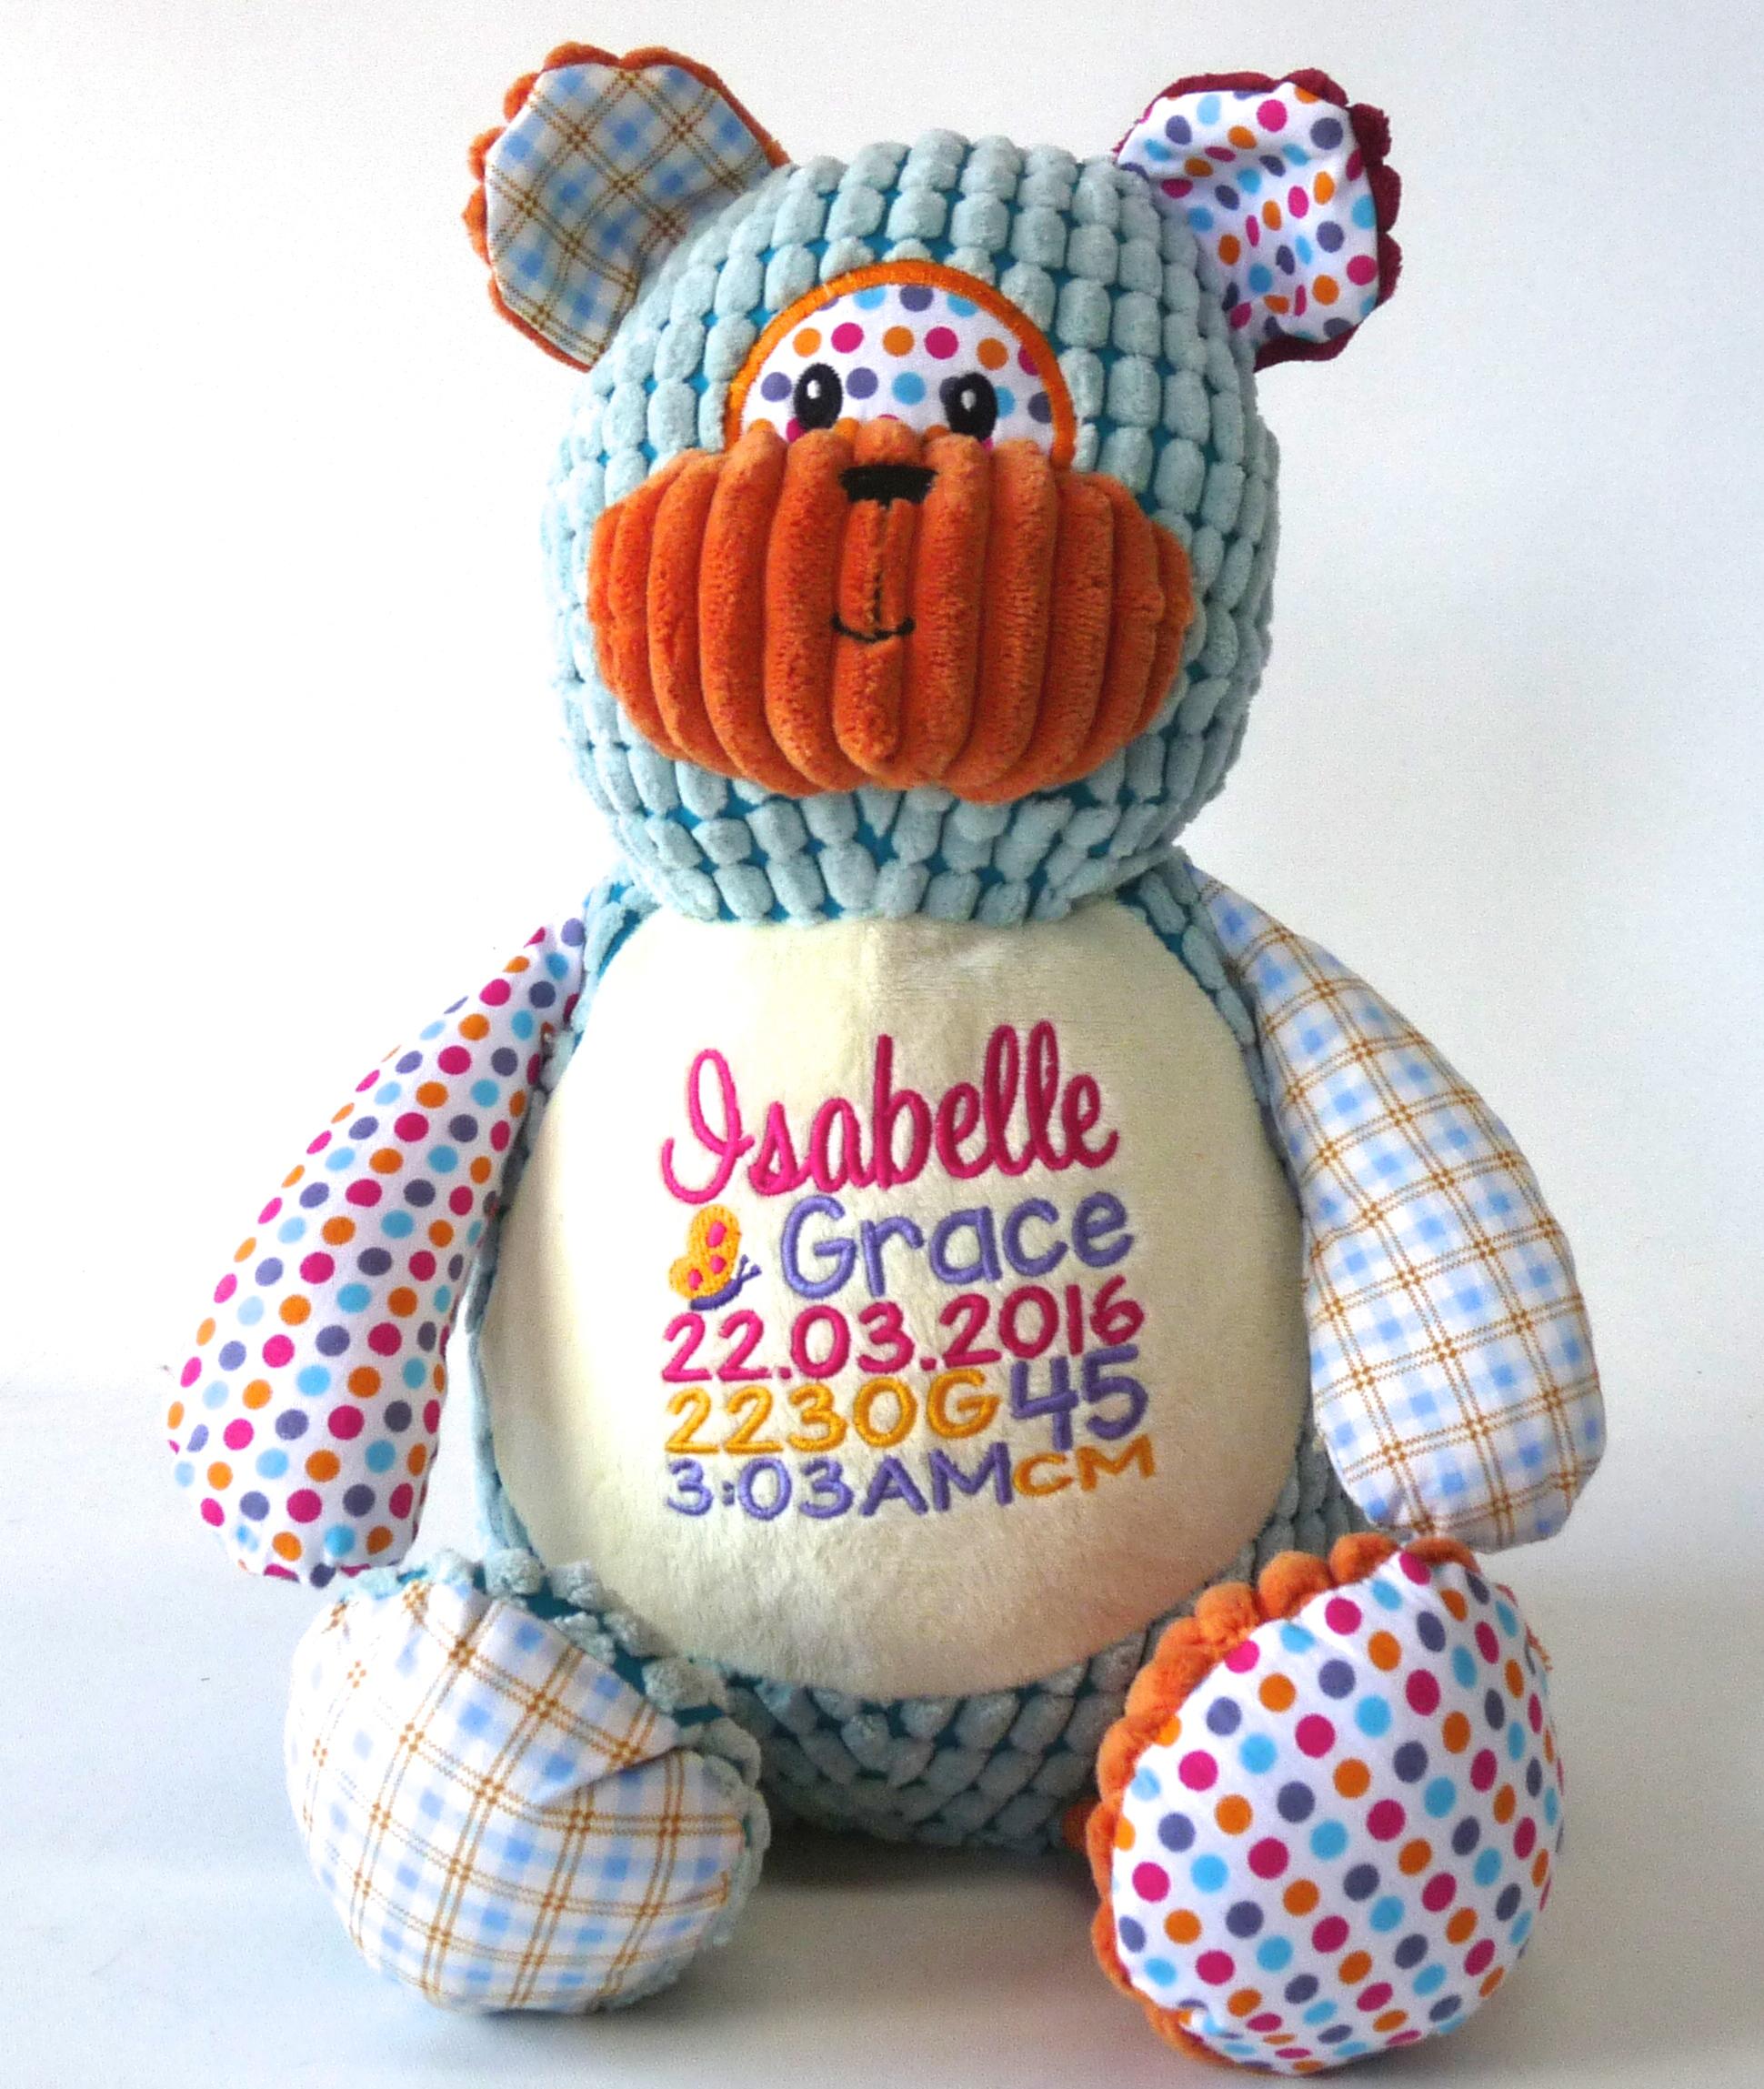 Patchwork Teddy - Birth announcement from My Teddy